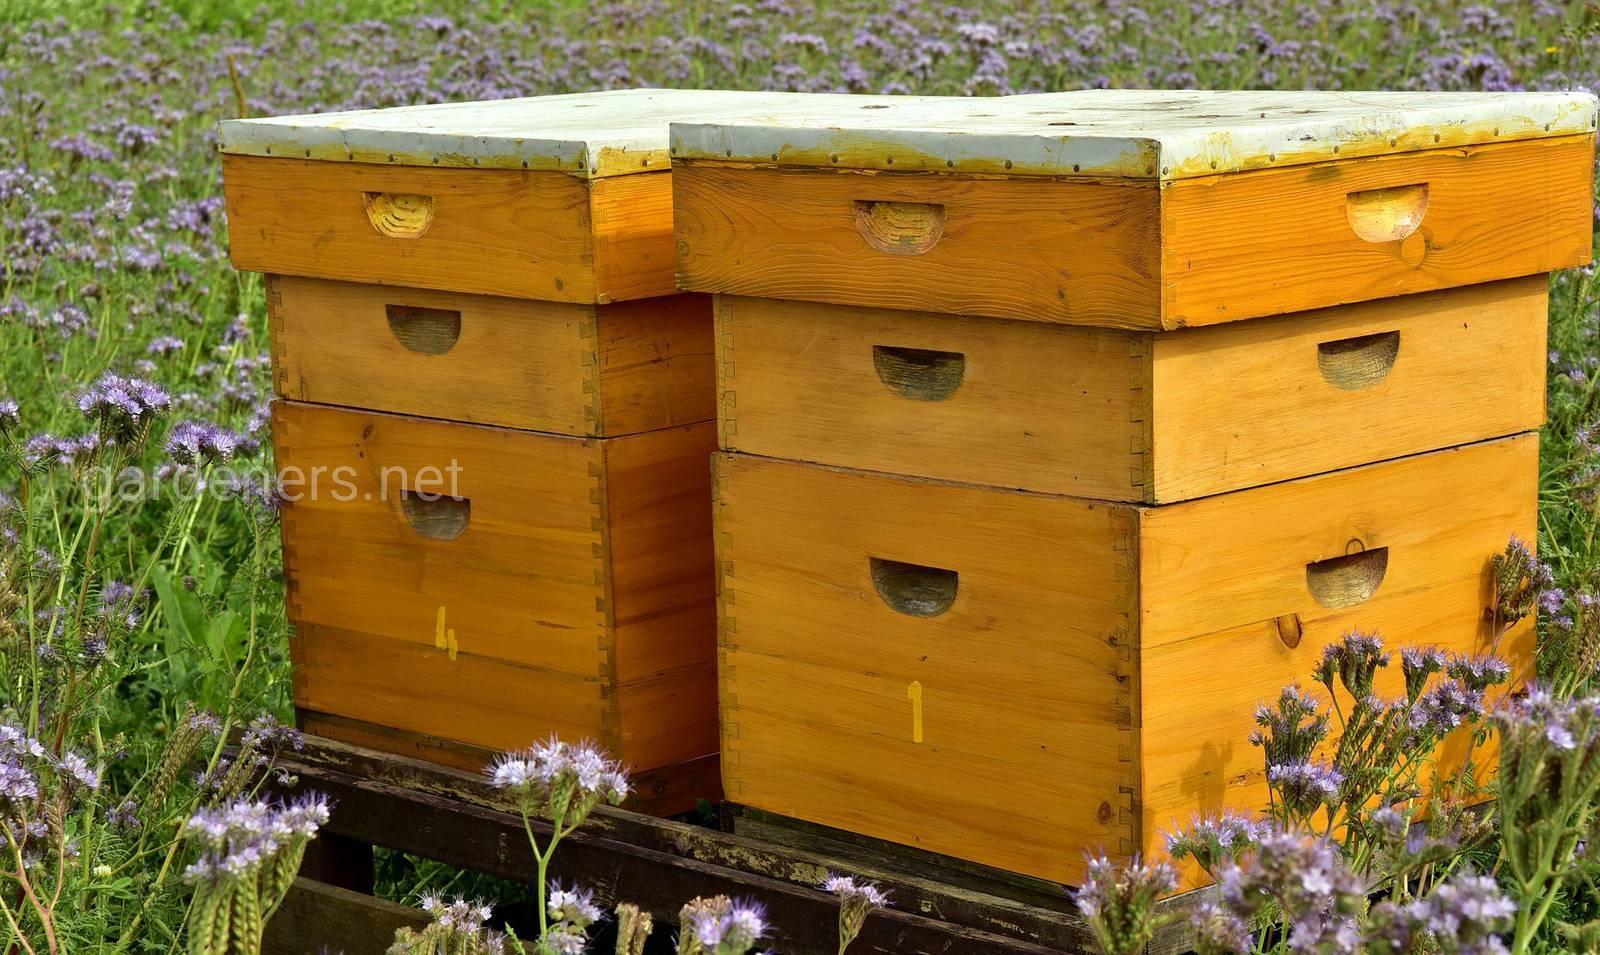 улья пчел.jpg